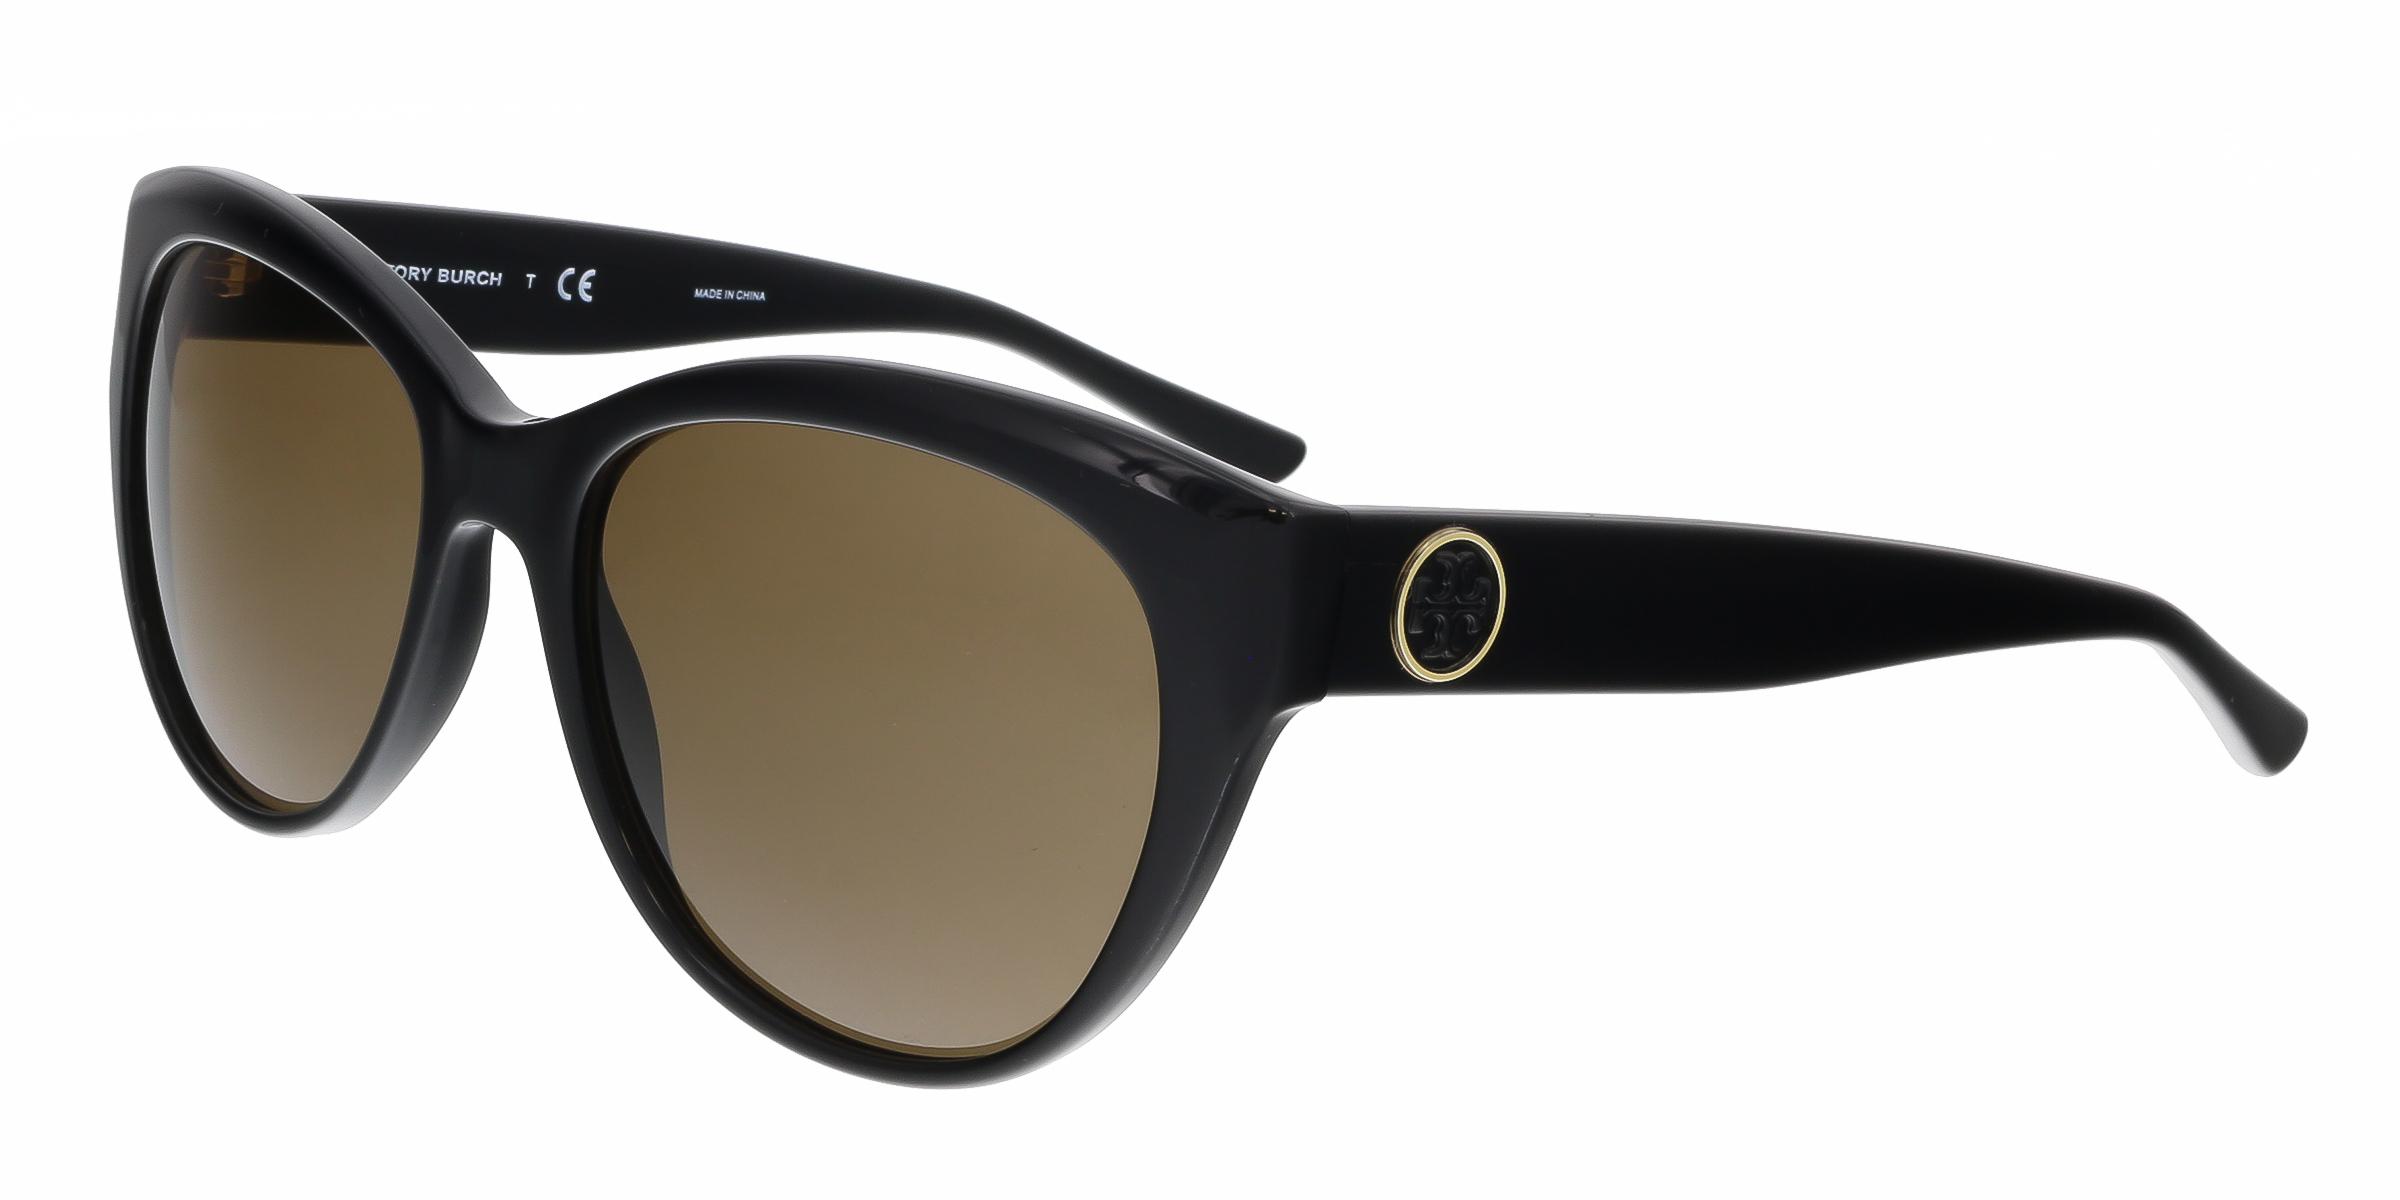 Tory Burch TY7084 131273 Black Cat Eye Sunglasses